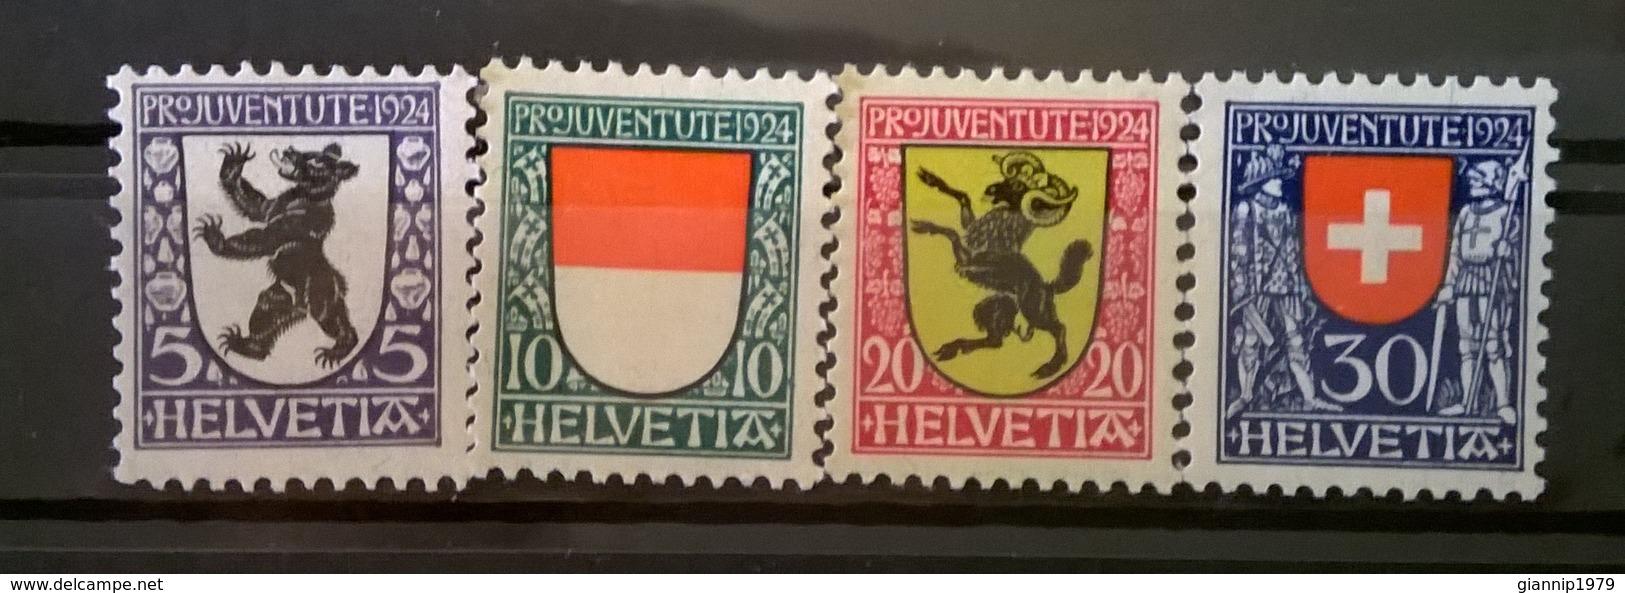 FRANCOBOLLI STAMPS SVIZZERA HELVETIA 1924 MNH** SERIE COMPLETA PRO JUVENTUTE - Svizzera